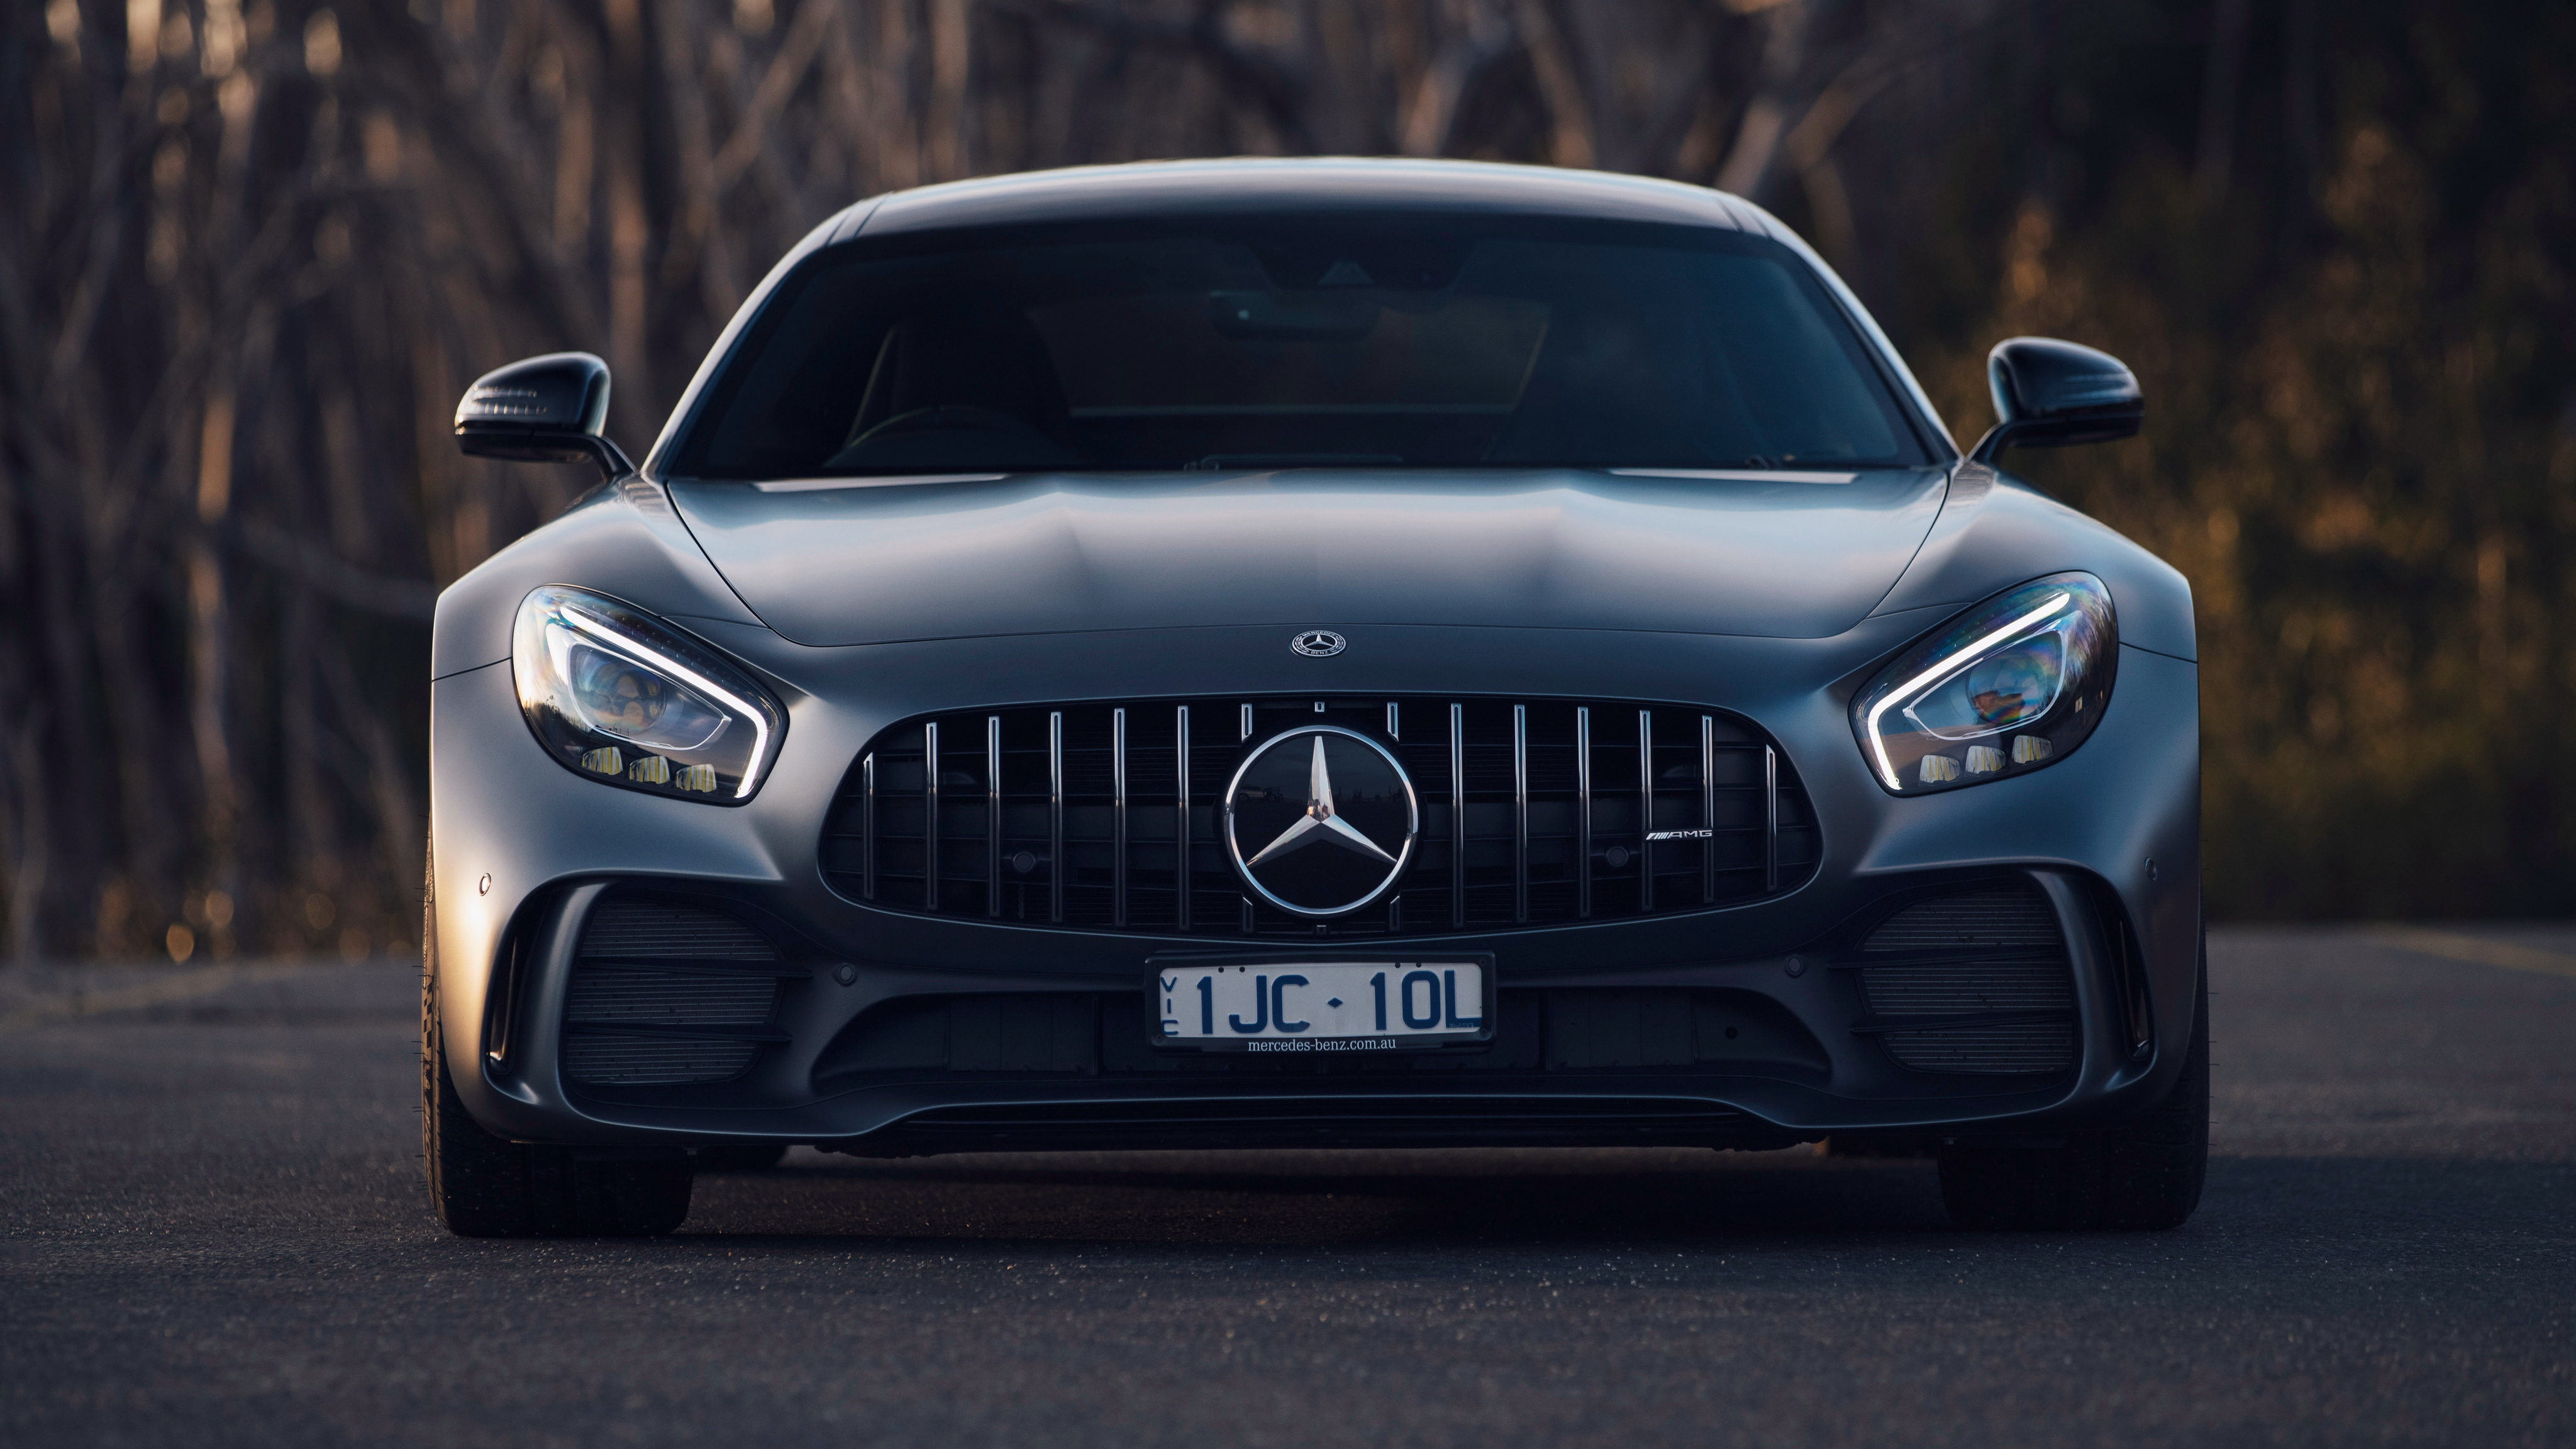 Mercedes Amg Gt R 2018 4k Wallpaper Hd Car Wallpapers Id 9363